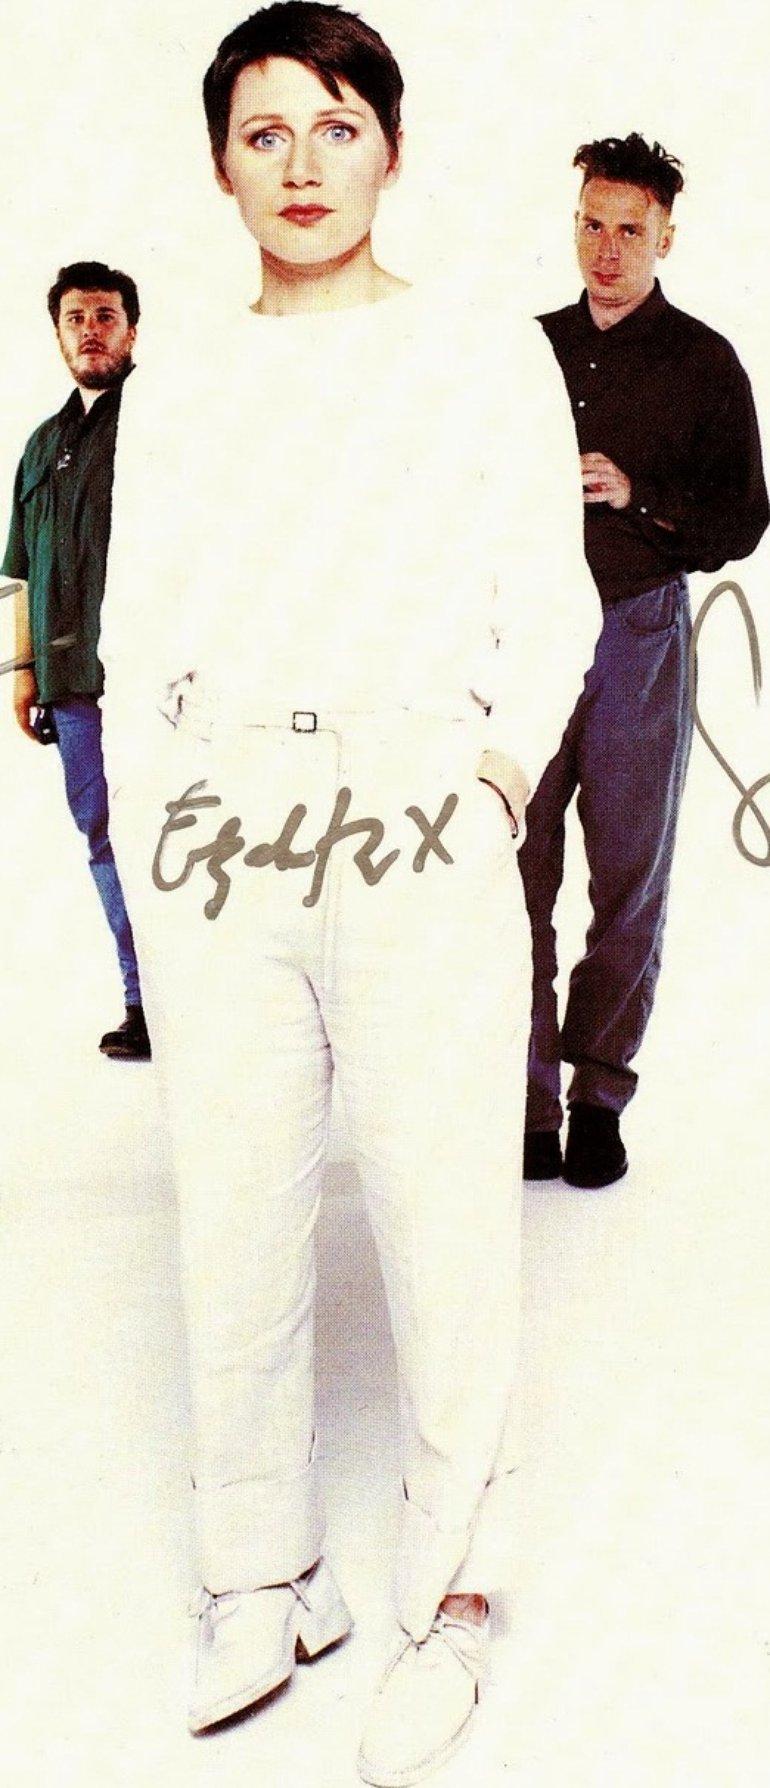 Cocteau Twins (1993)